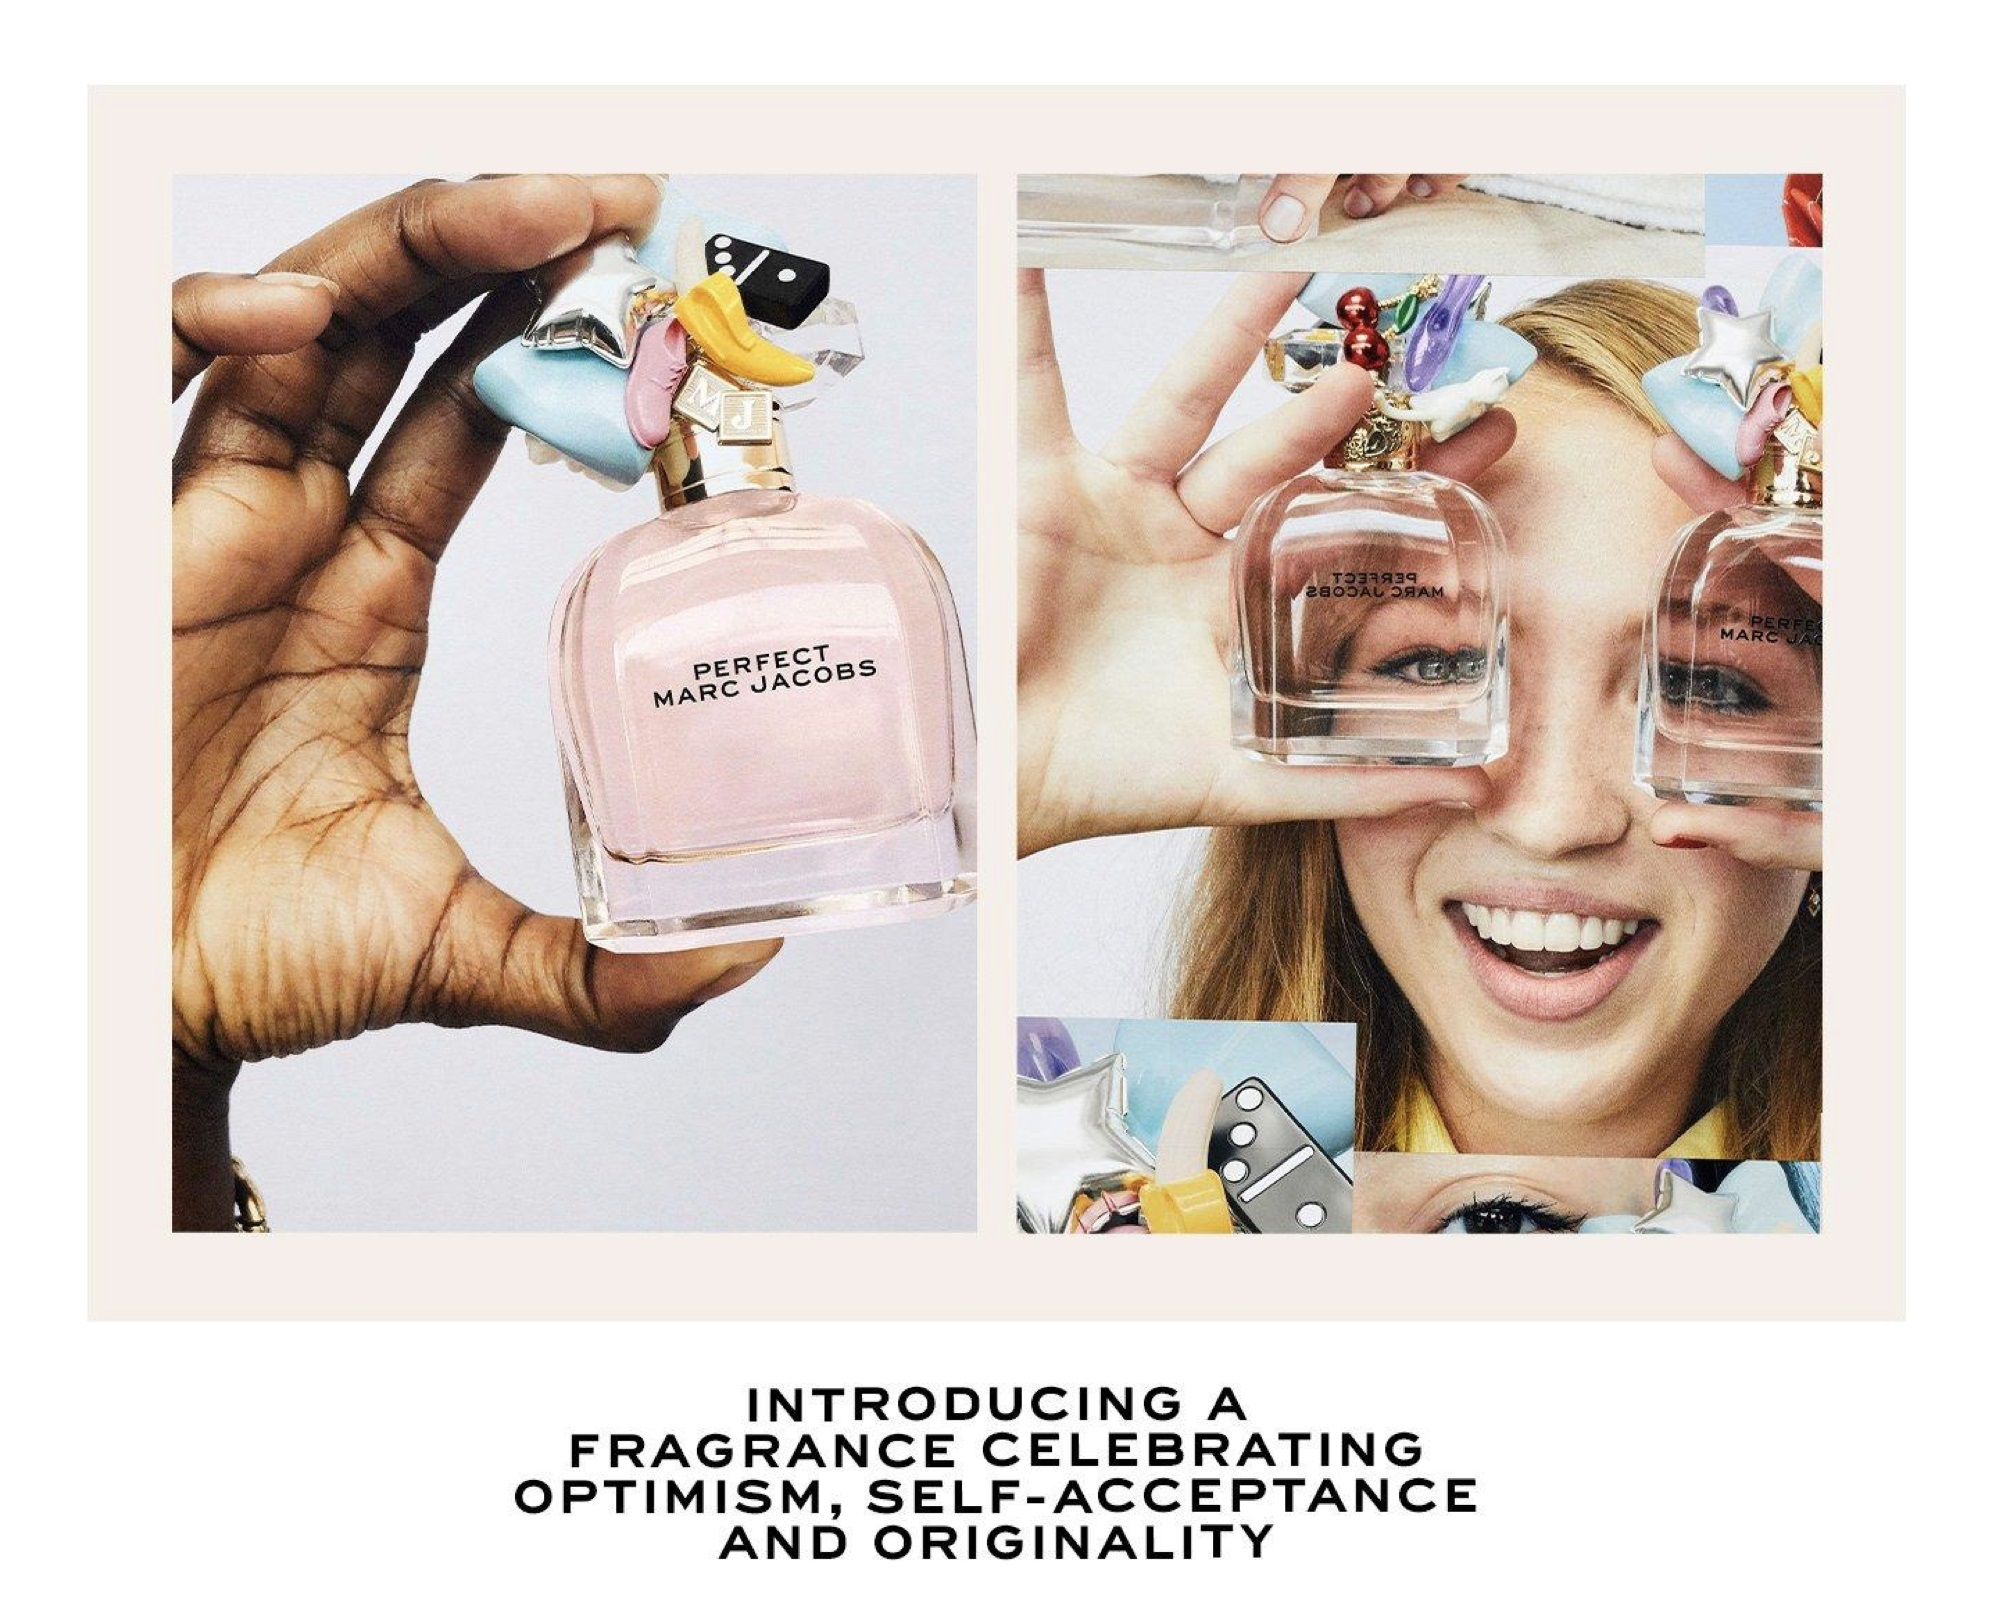 Marc Jacobs Perfect kampania